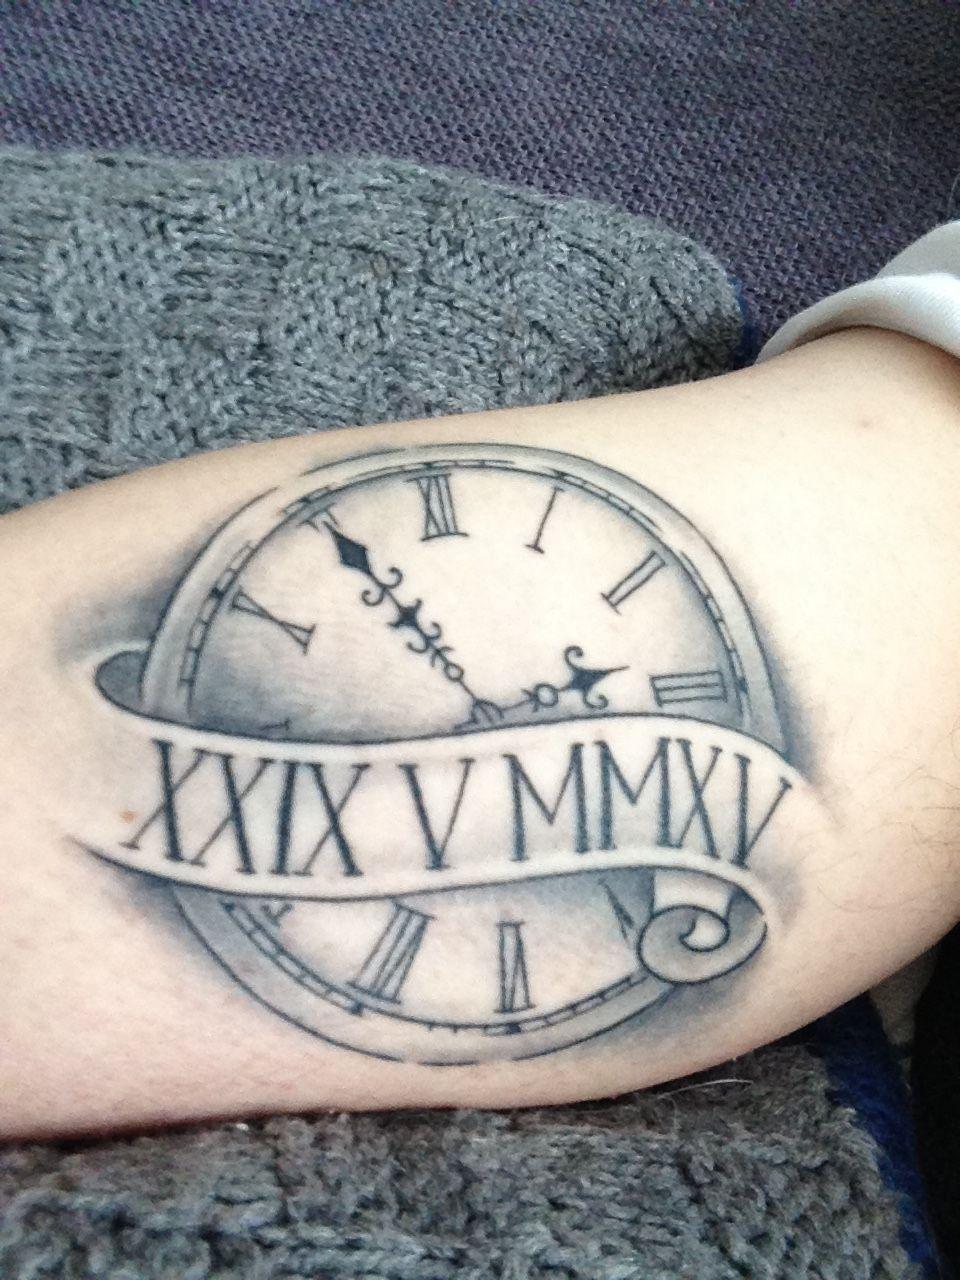 My Clock Tattoo With Birthdate Of My Son Tattoos For Kids Tattoo For My Son Clock Tattoo